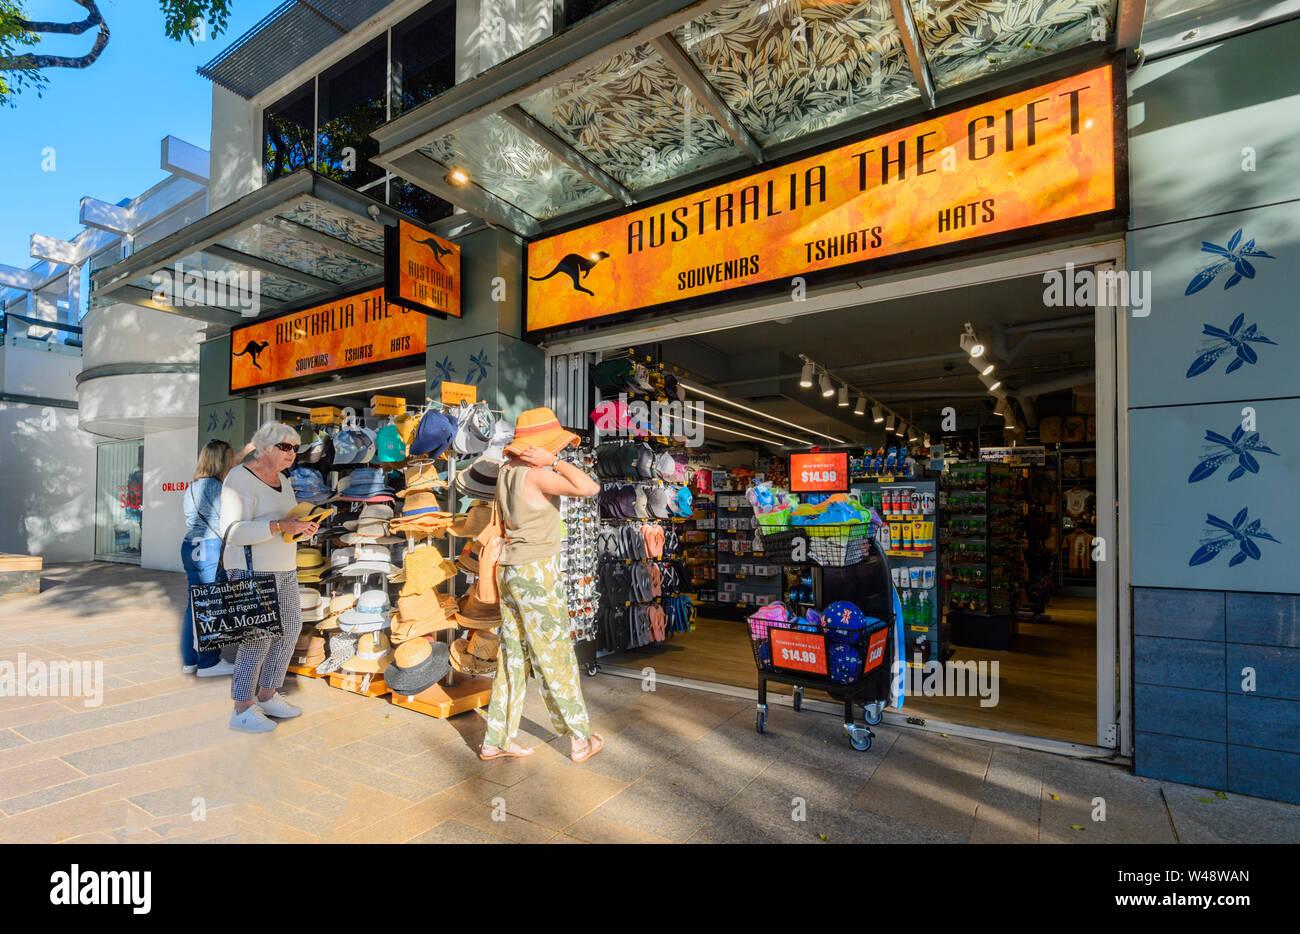 Exterior of Australia The Gift shop in popular touristic Hastings Street, Noosa Heads, Sunshine Coast, Queensland, QLD, Australia Stock Photo